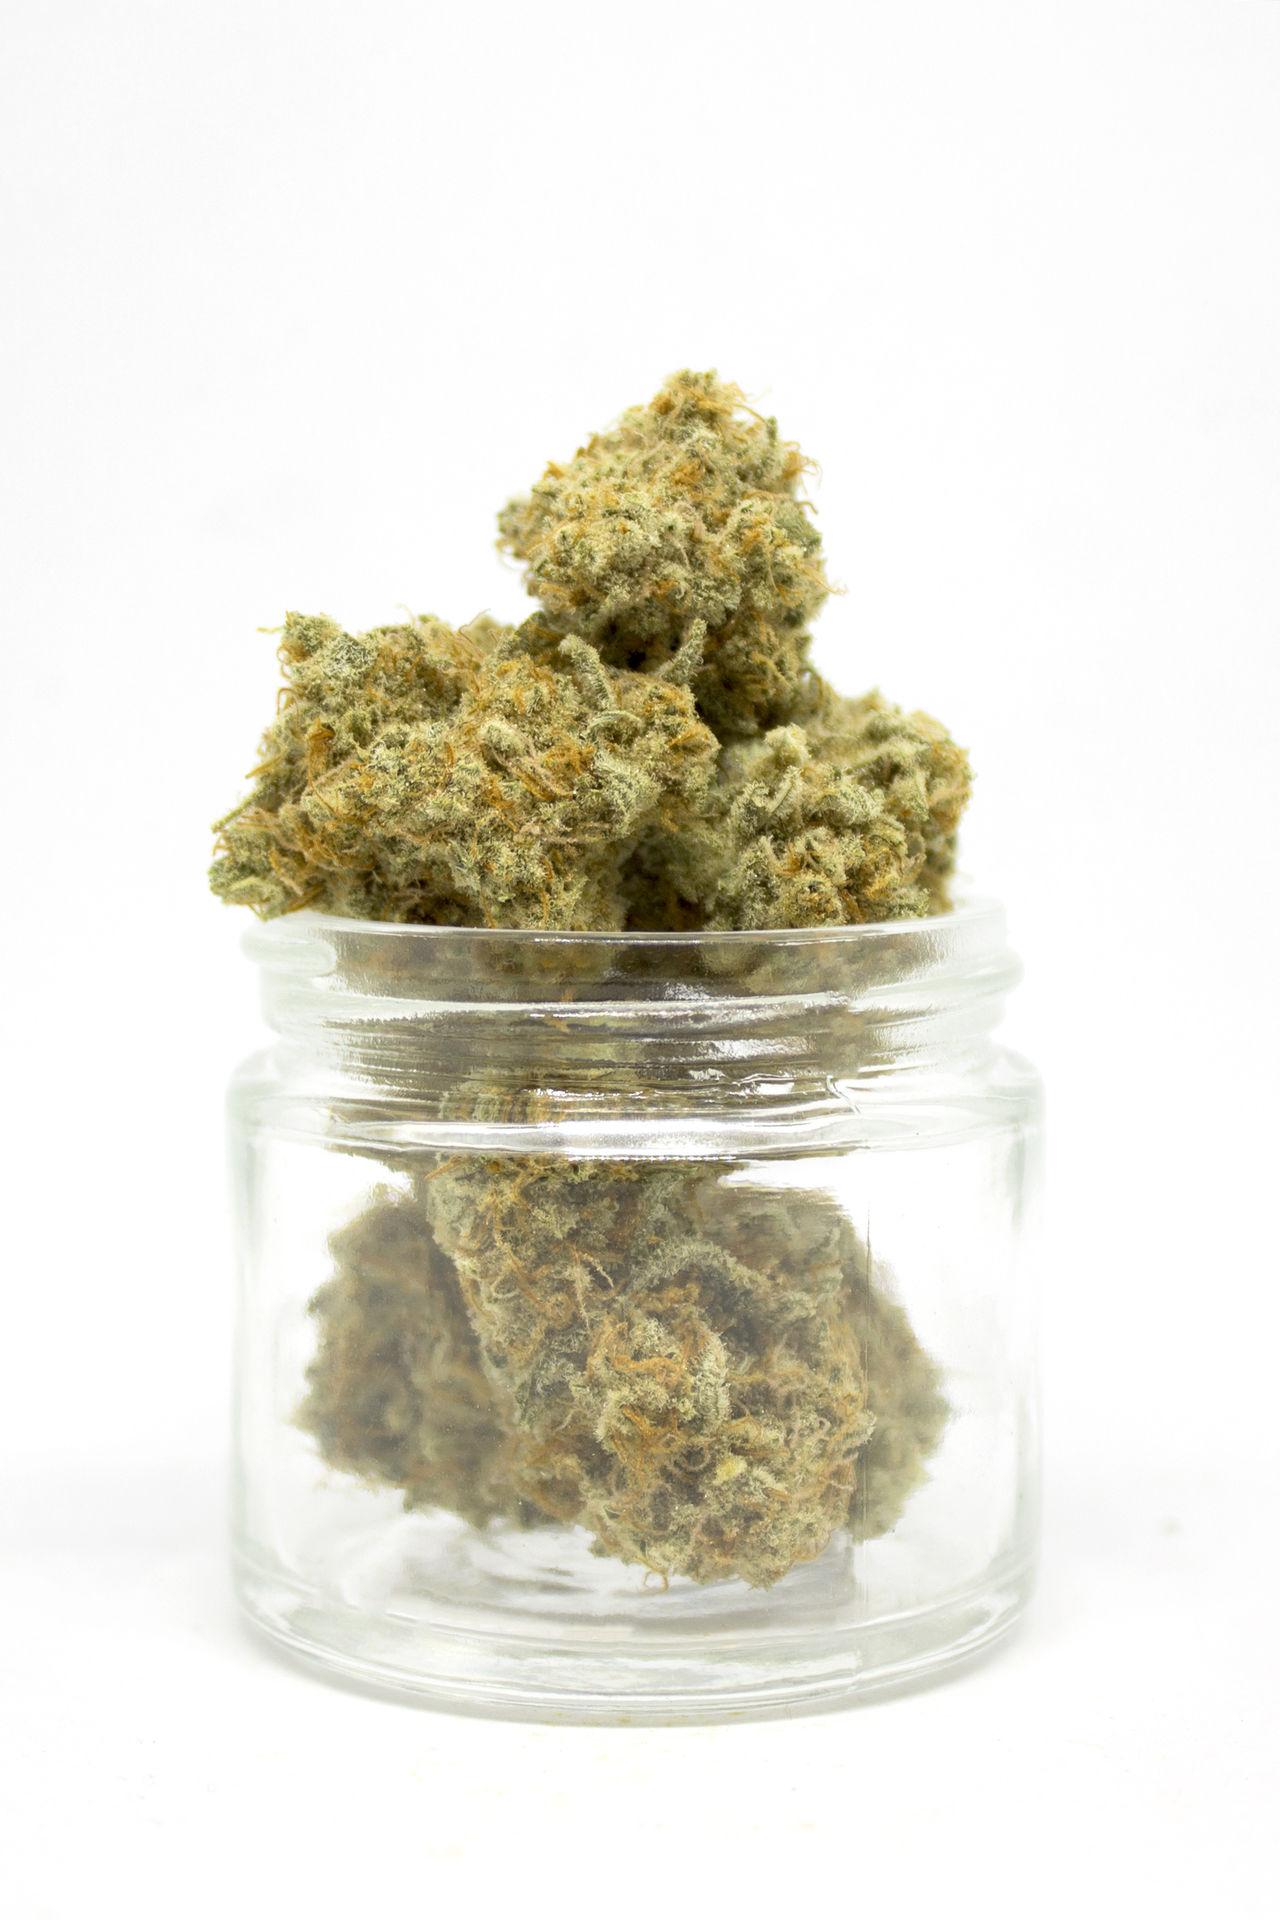 Alternative Medicine Cannabis Cannabis Plant Drugs Herb Herbal Herbal Medicine Jar Marijuana Marijuana - Herbal Cannabis Medical Medical Cannabis Medical Marijuana Weed Weed Life